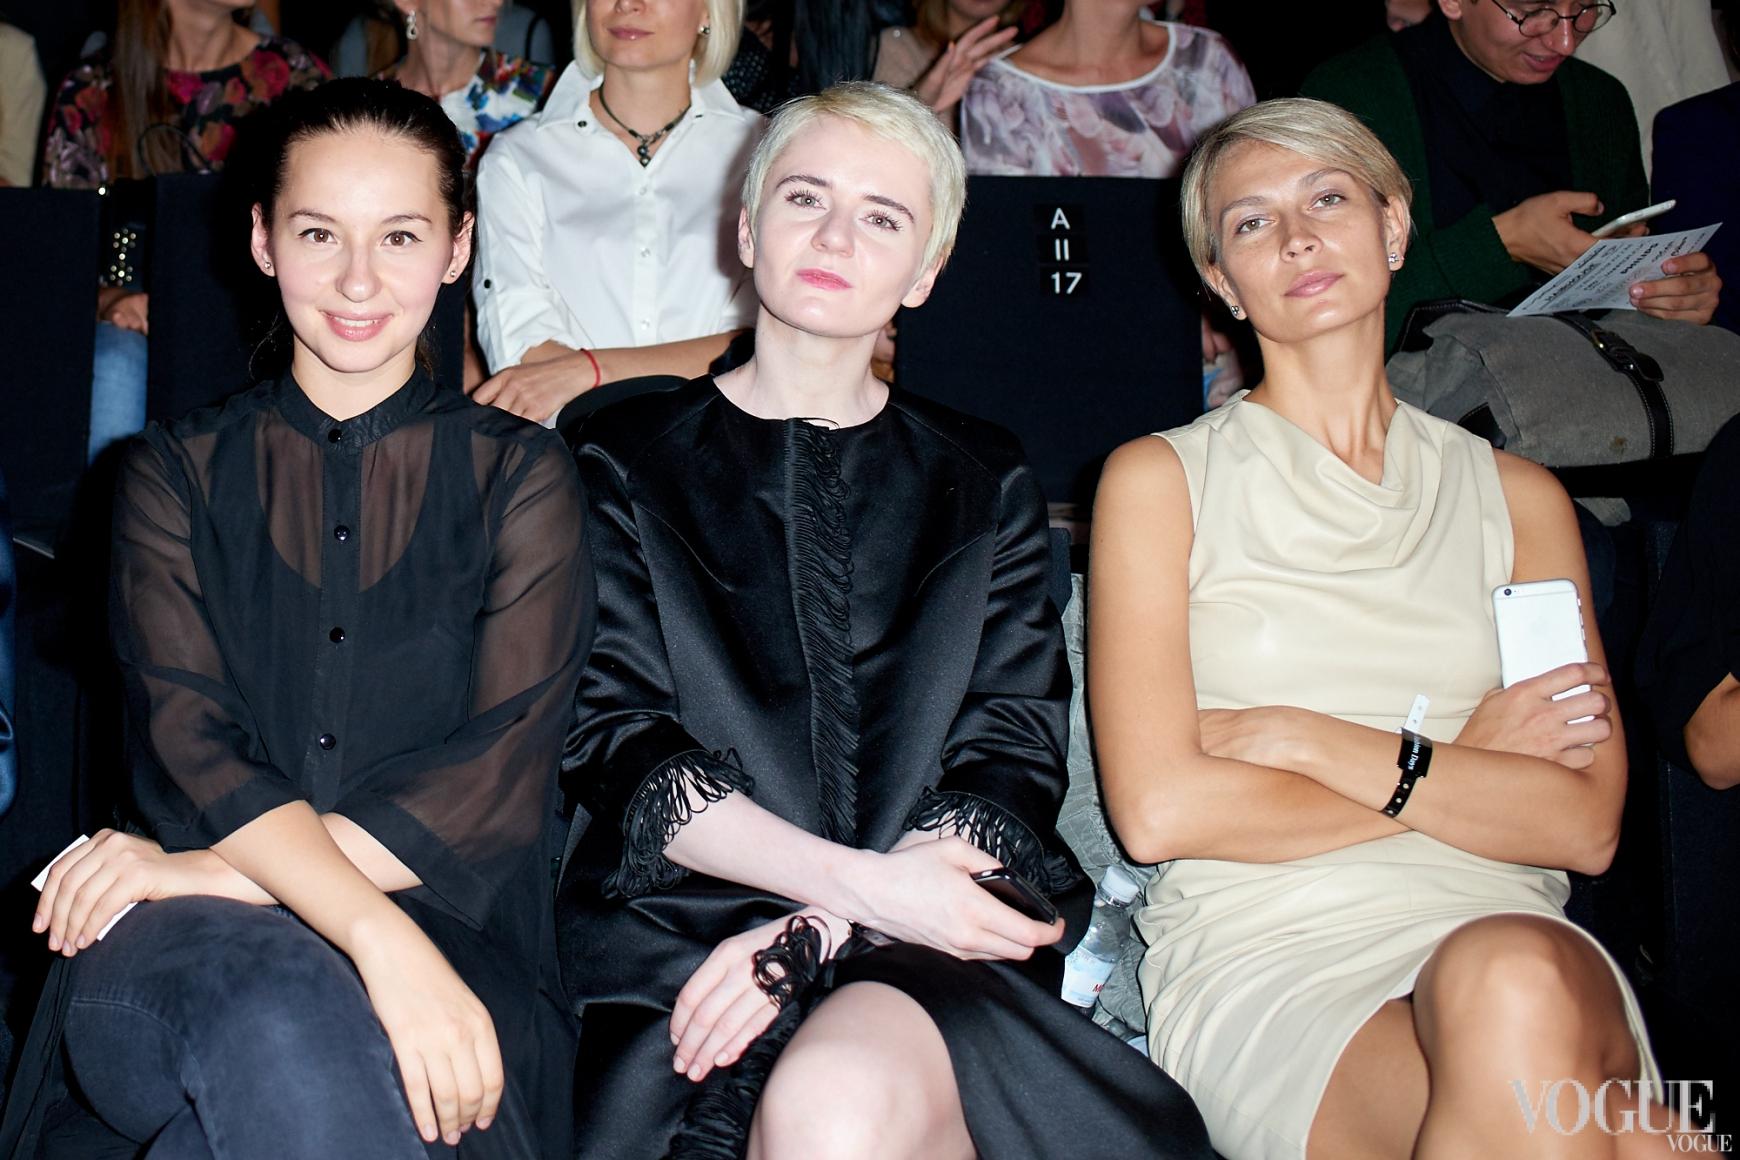 Виолетта Федорова, Ольга Януль и Маша Цуканова